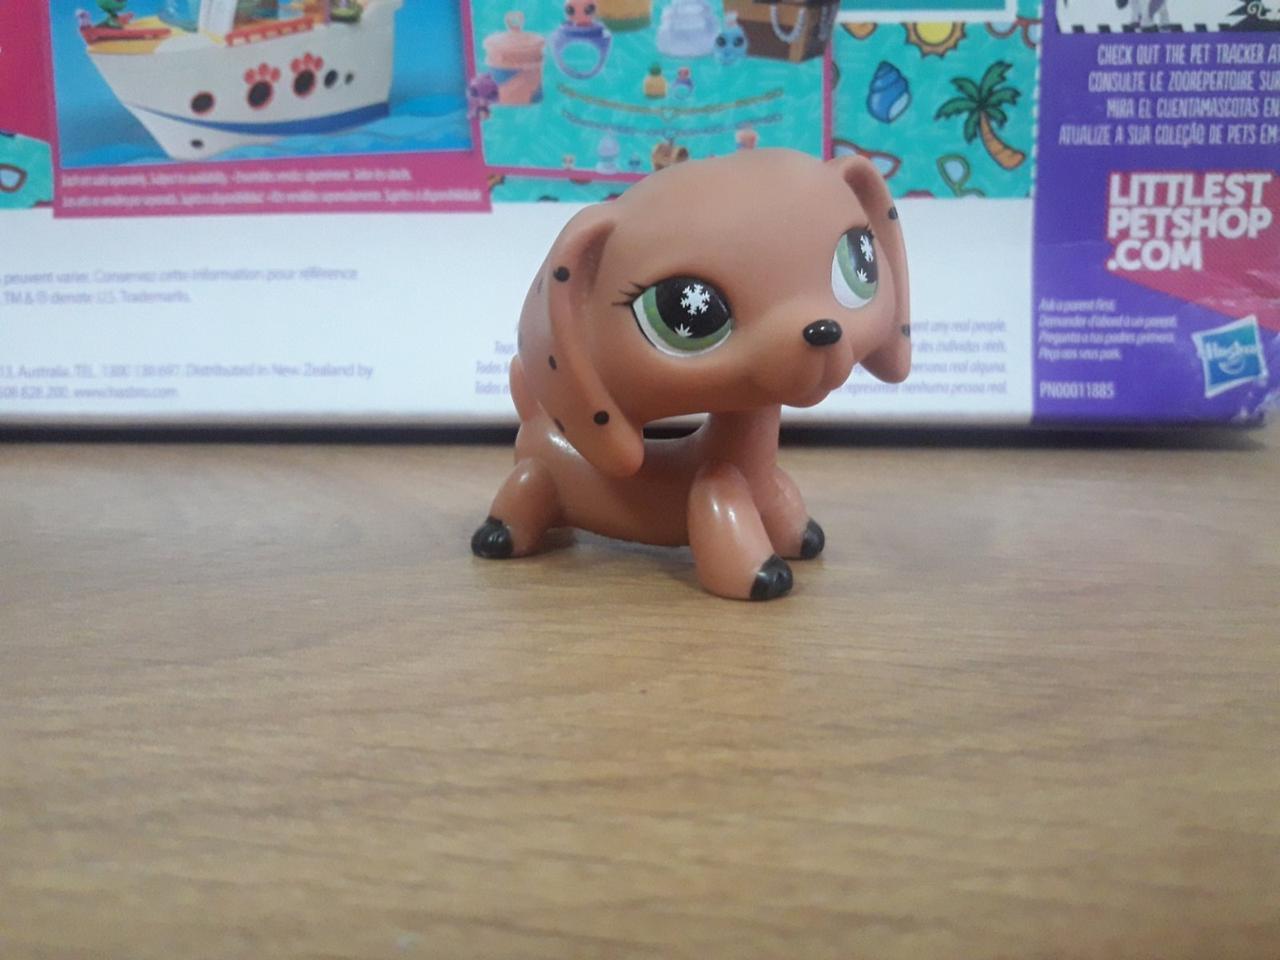 Lps littlest pet shop стоячки - лпс такса Hasbro -старая коллекция